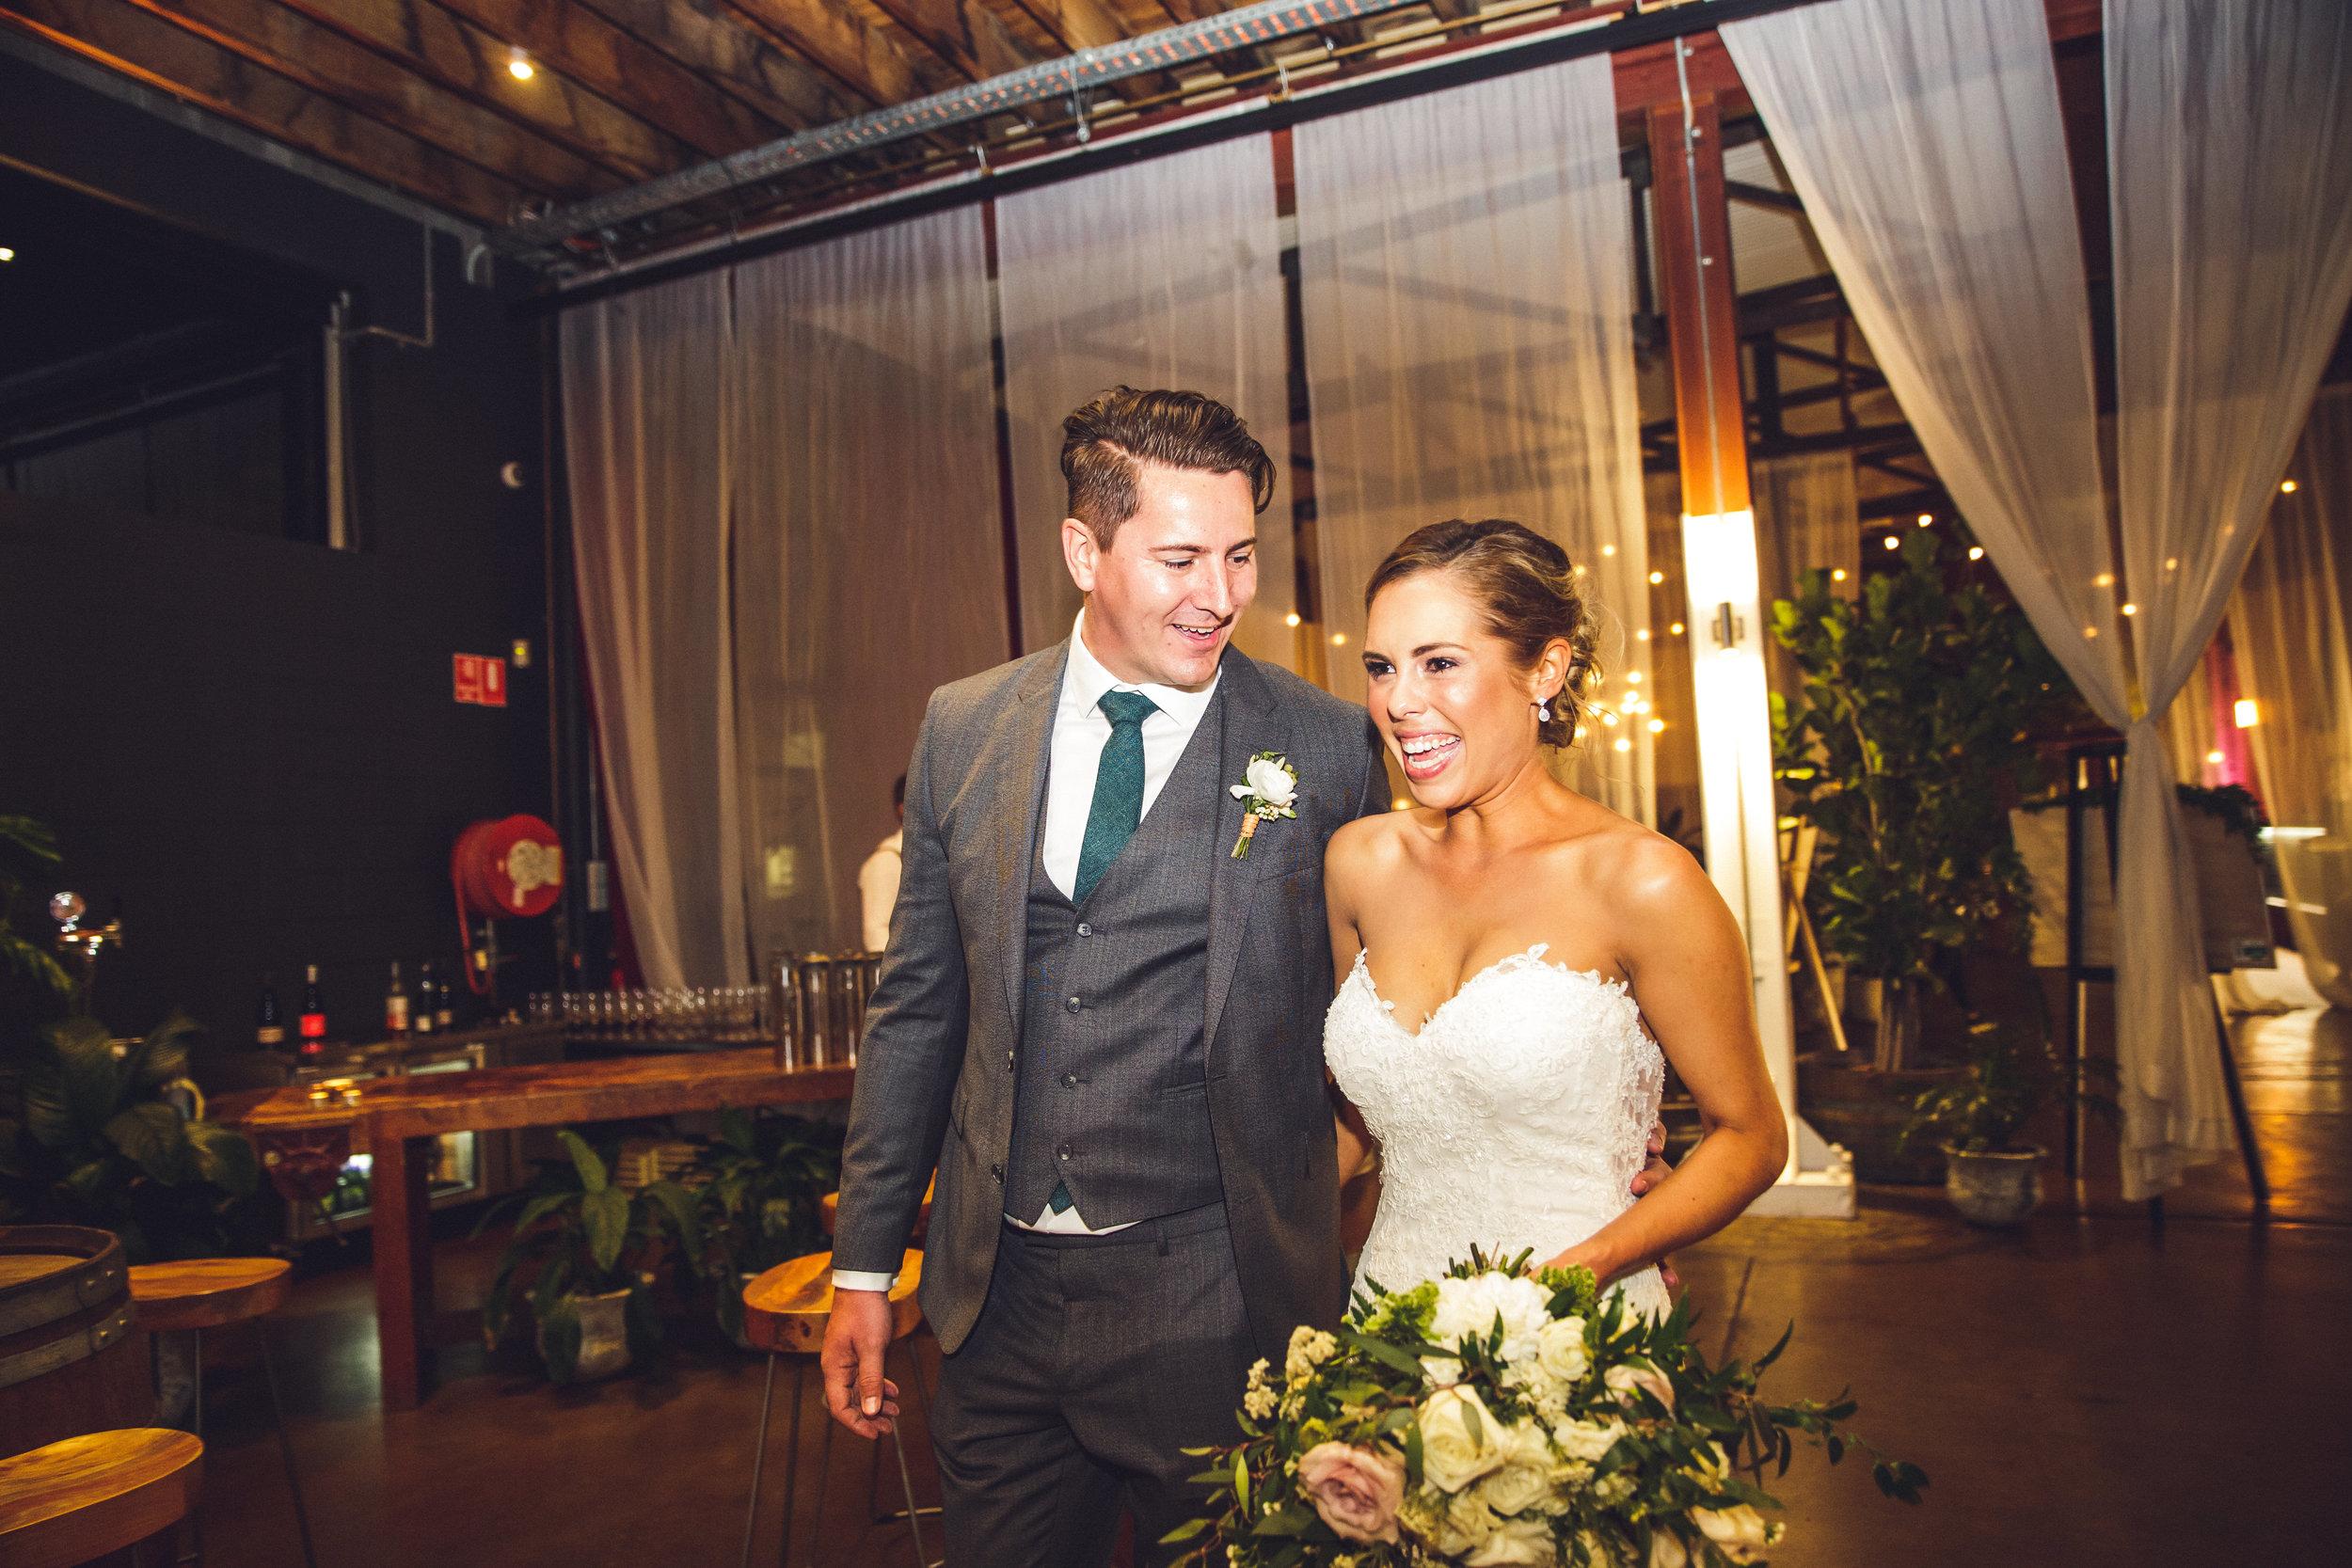 lightspace-brisbane-wedding-036.JPG